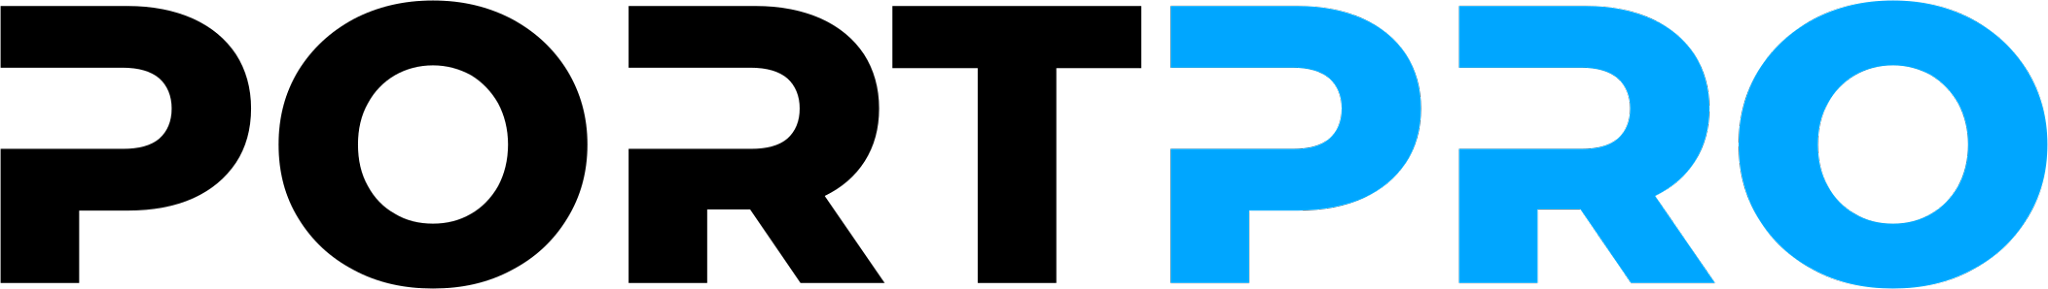 Portpro relies on Rossum